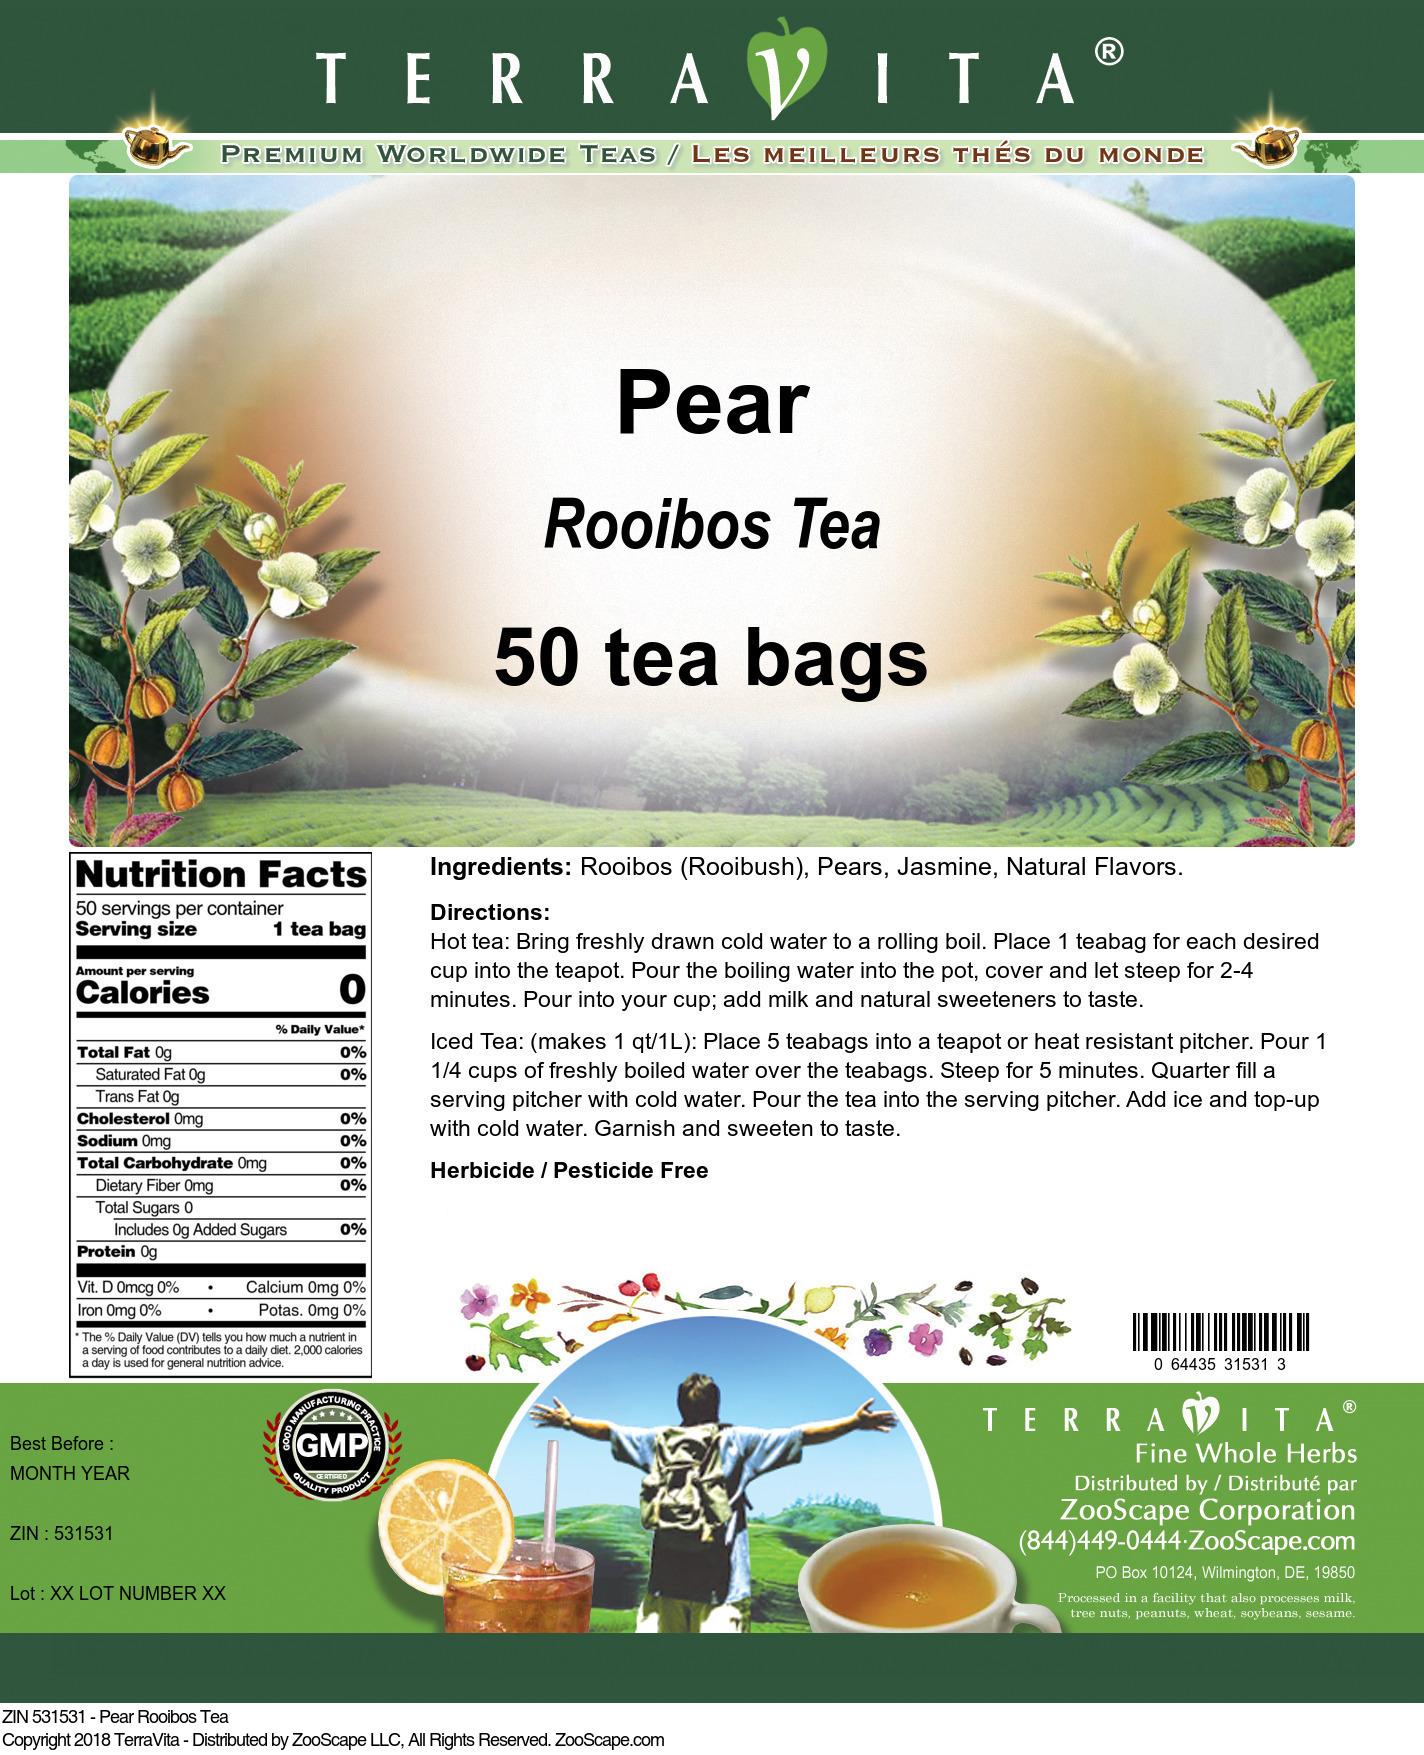 Pear Rooibos Tea